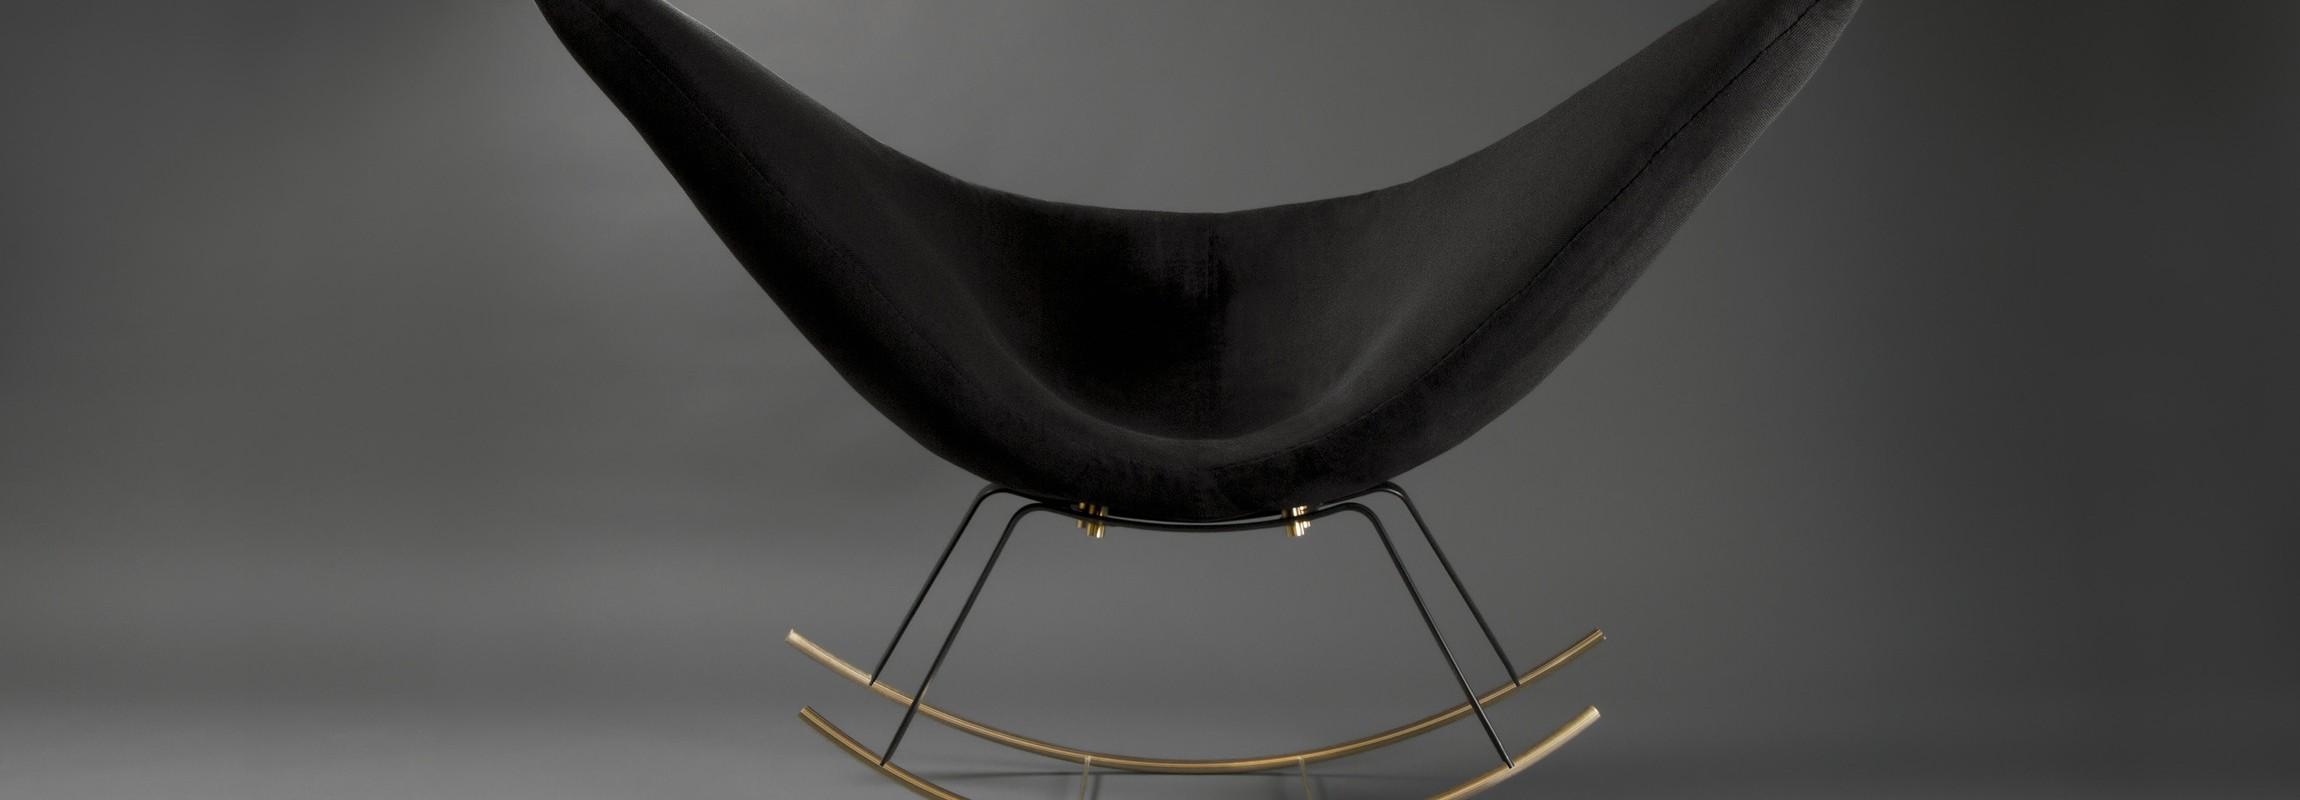 Great Egret Chair - SAYAR GARIBEH - 004